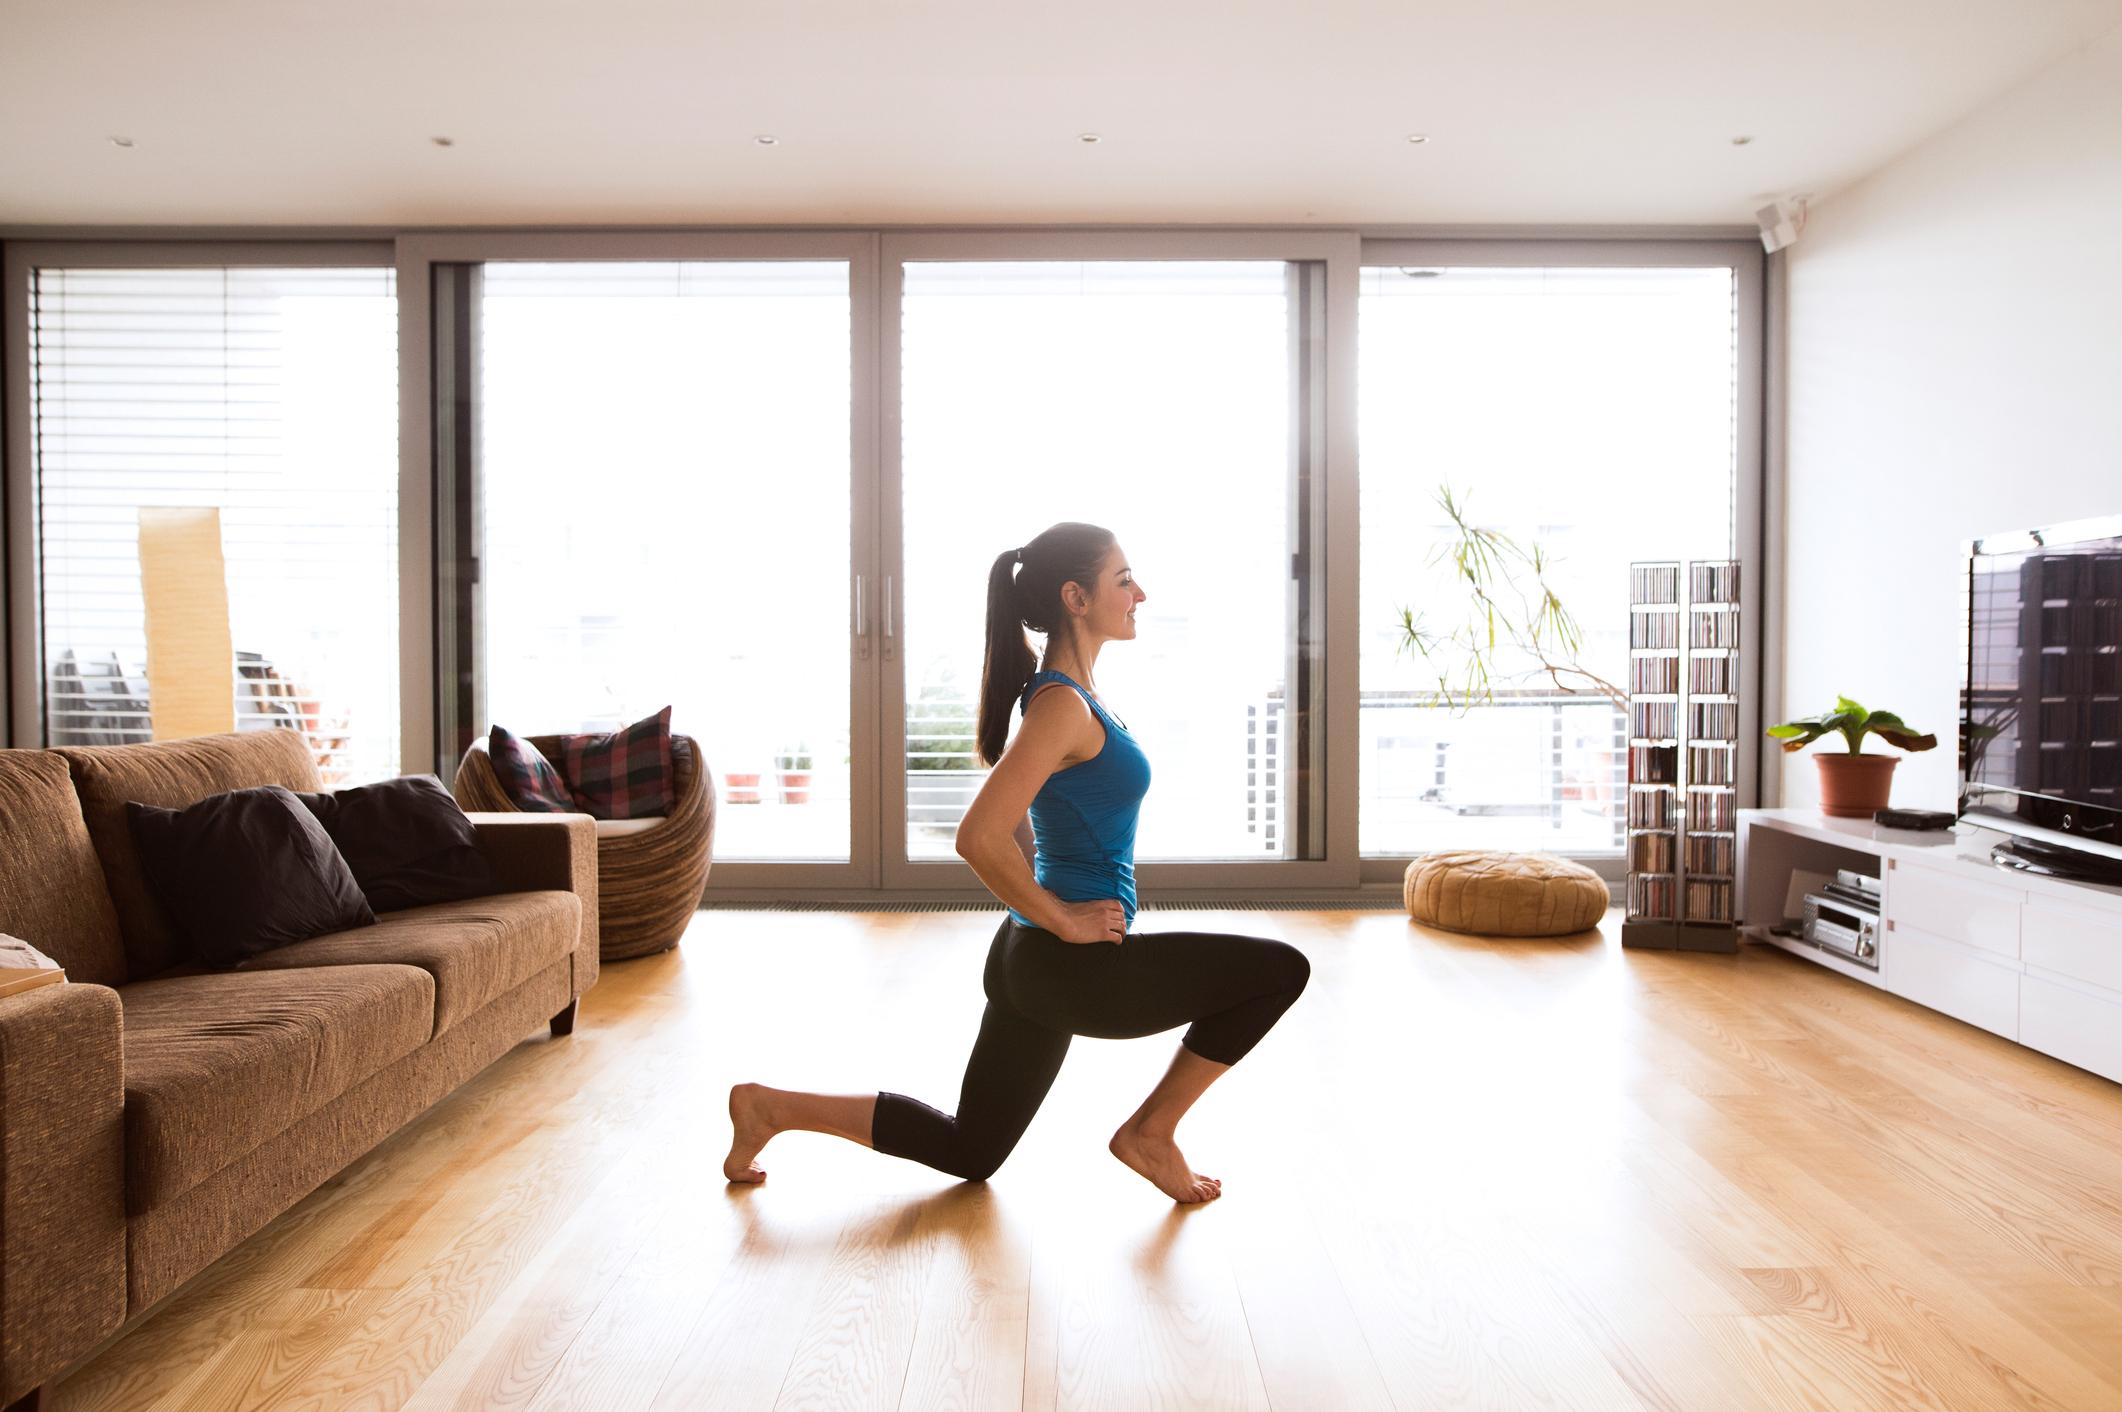 4 exercices pour garder la forme